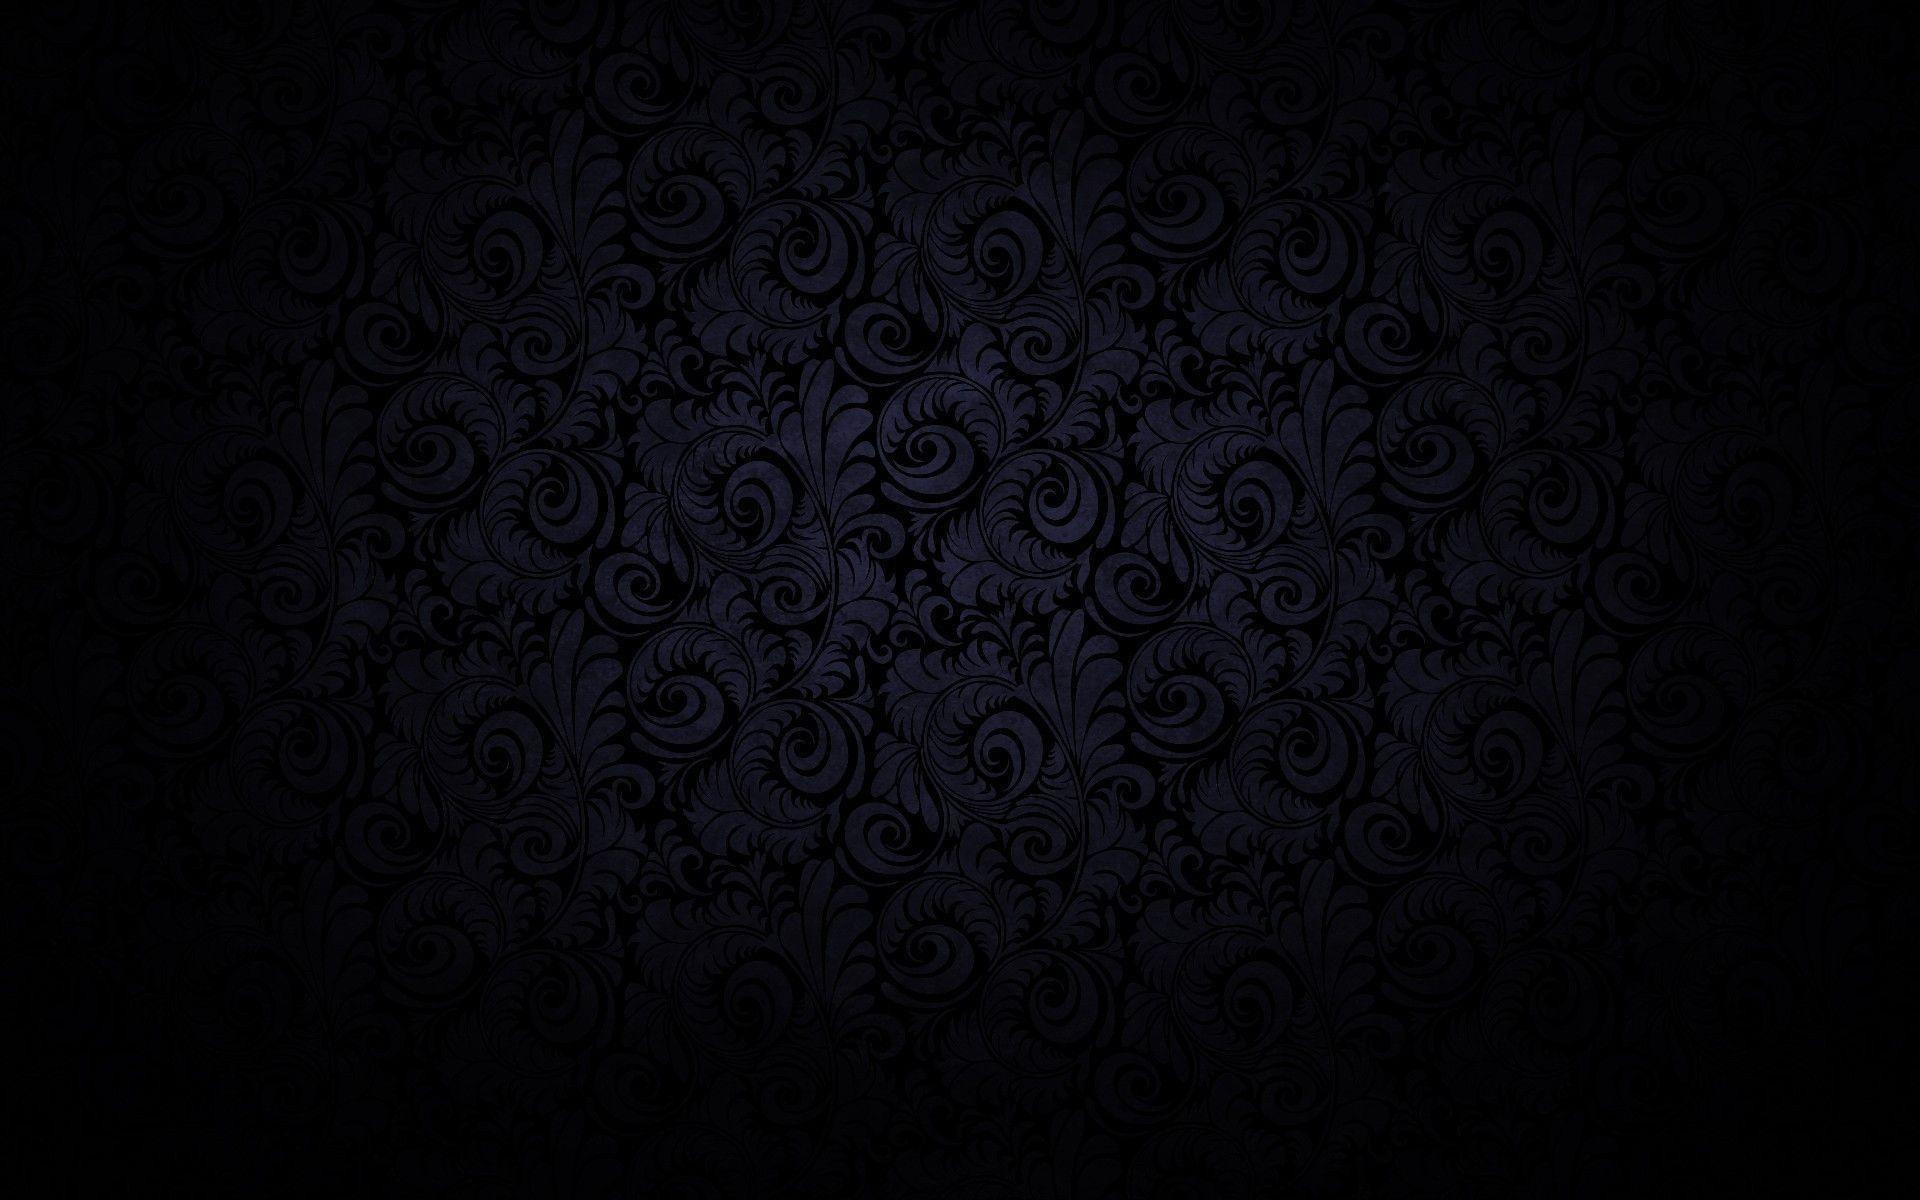 1920x1200 Pretty Black Patterns Background Wallpaper HD